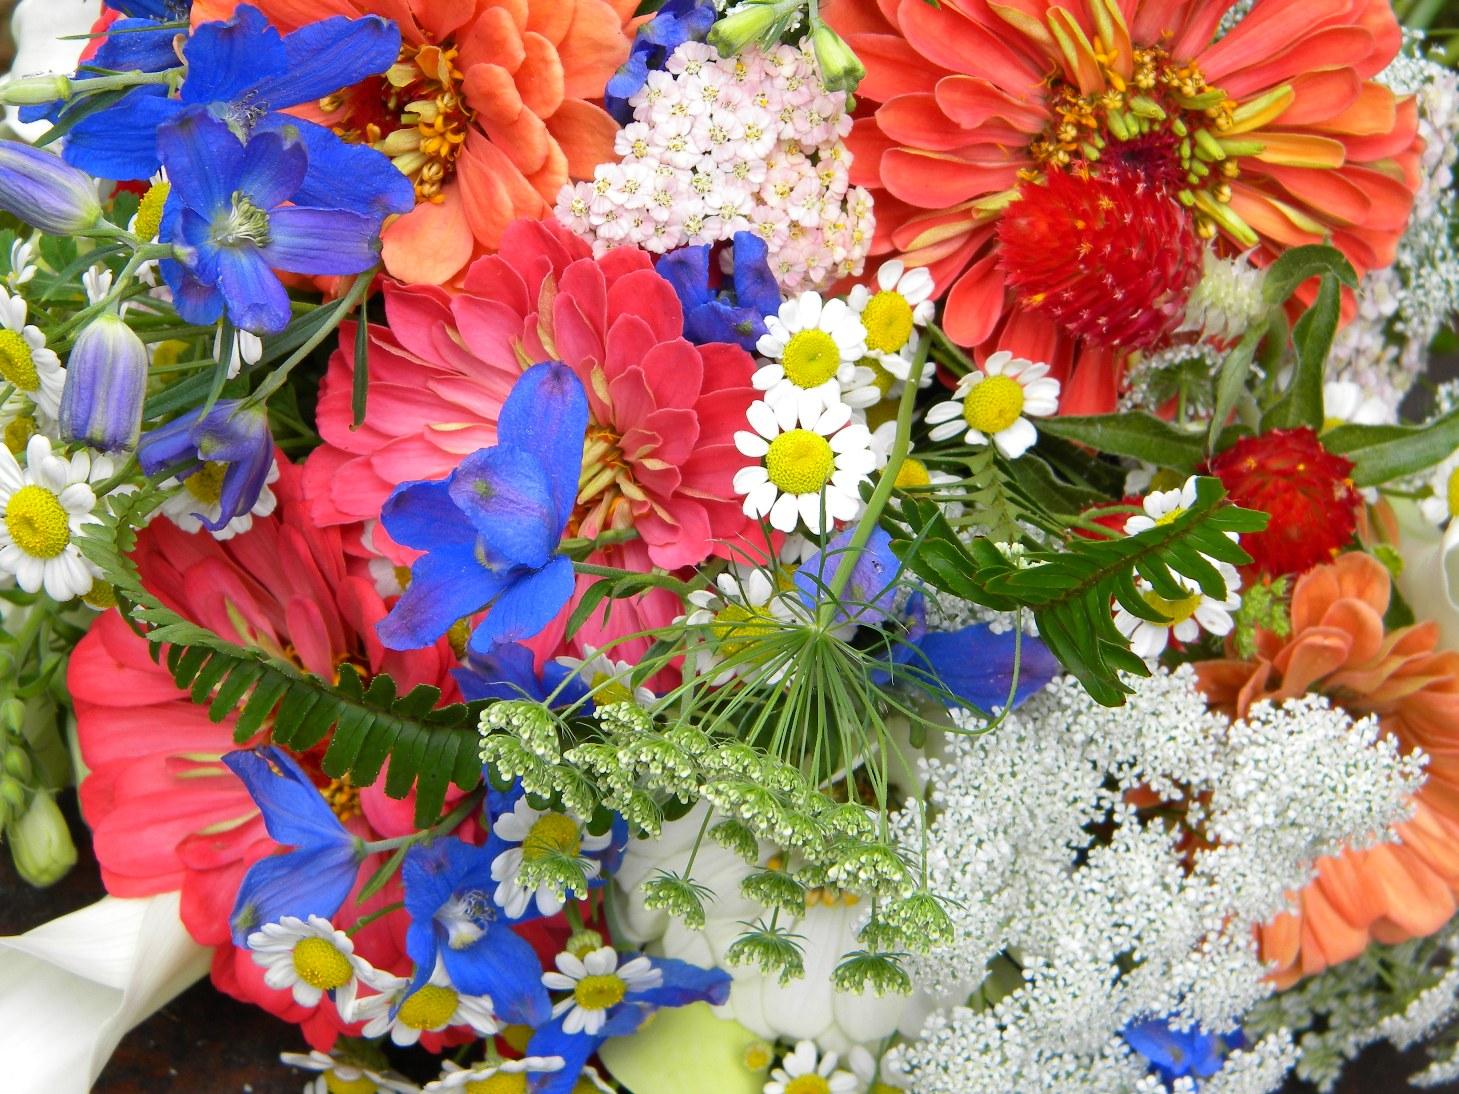 Wedding Flowers From Springwell: Summer Bouquet In Warm